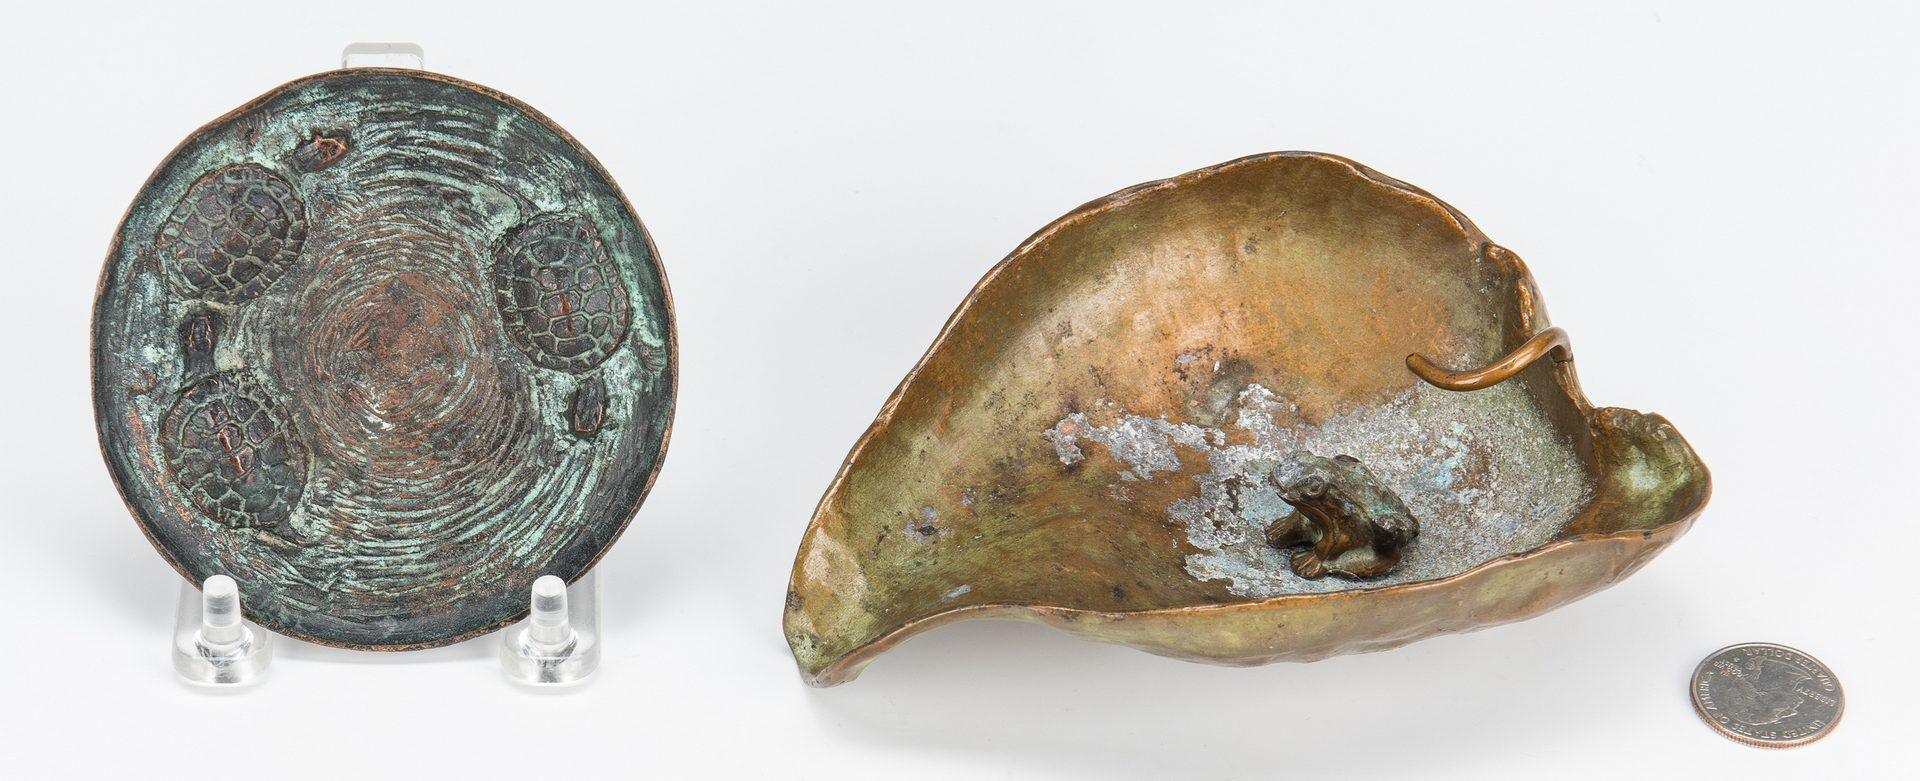 Lot 341: 2 Bronze Frog & Turtle Sculptures, incl. McClelland Barclay